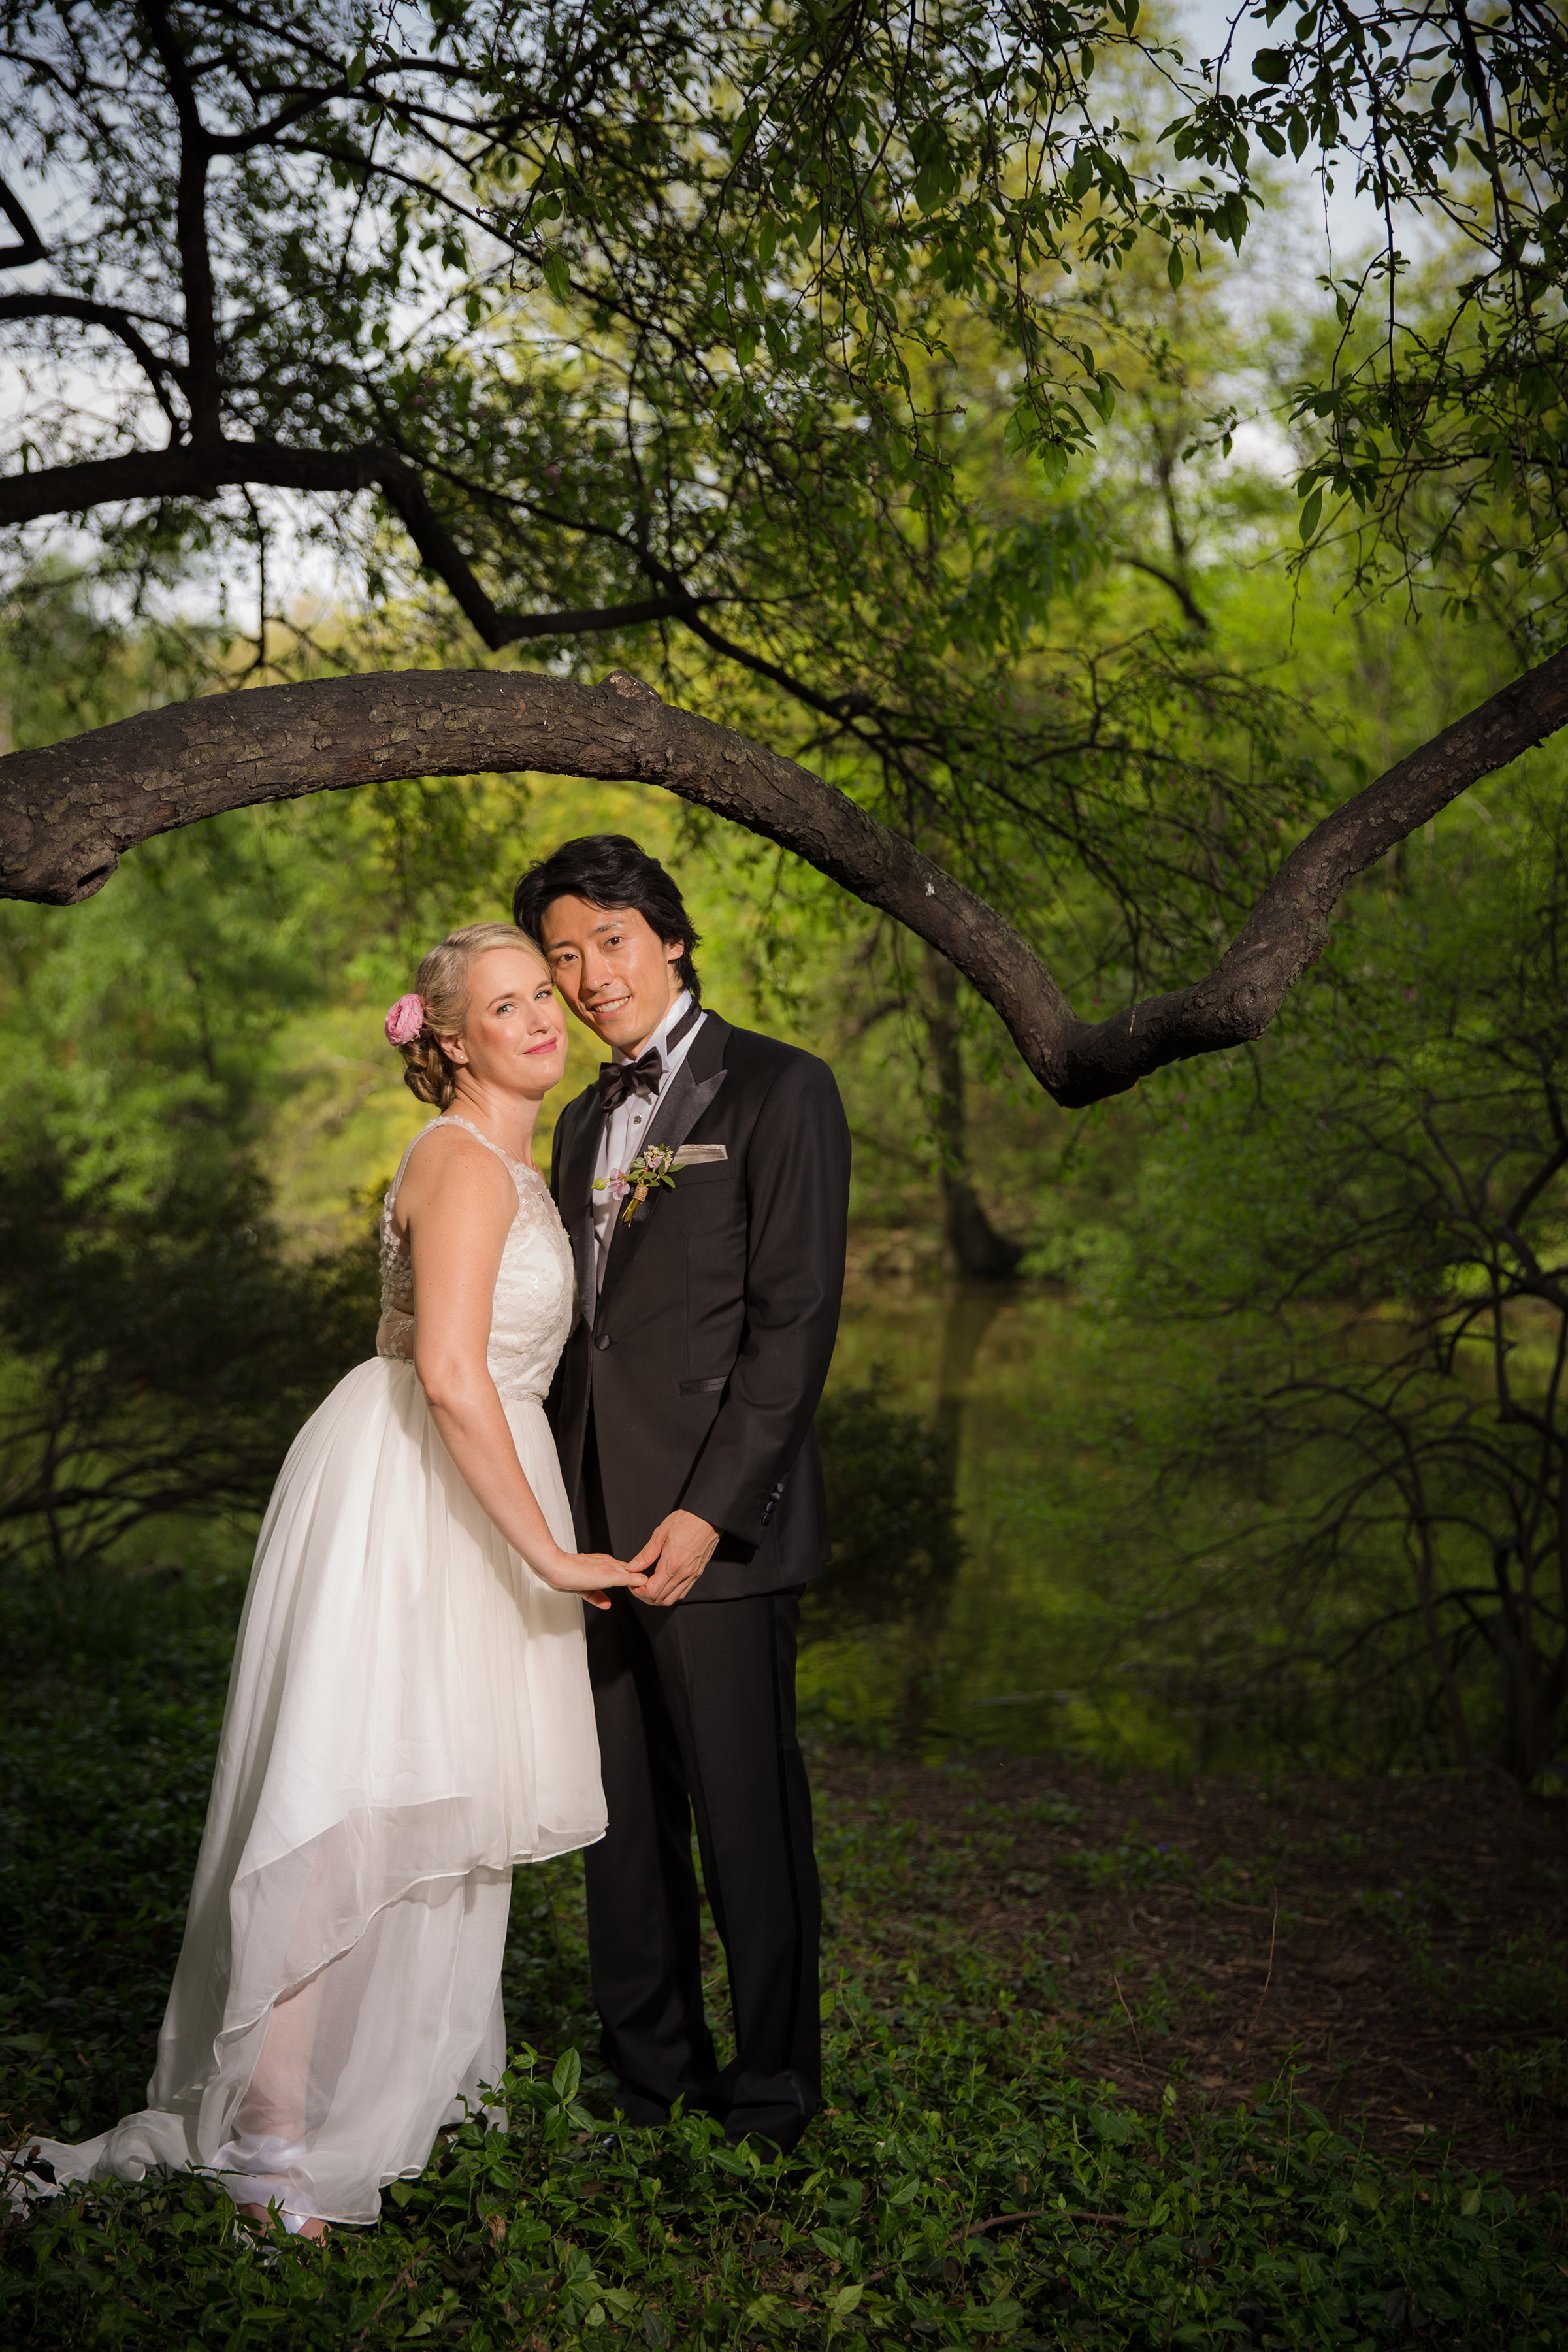 victorious-events-nyc-010-colleen-taka-central-park-zoo-wedding-raymond-hamlin.jpg